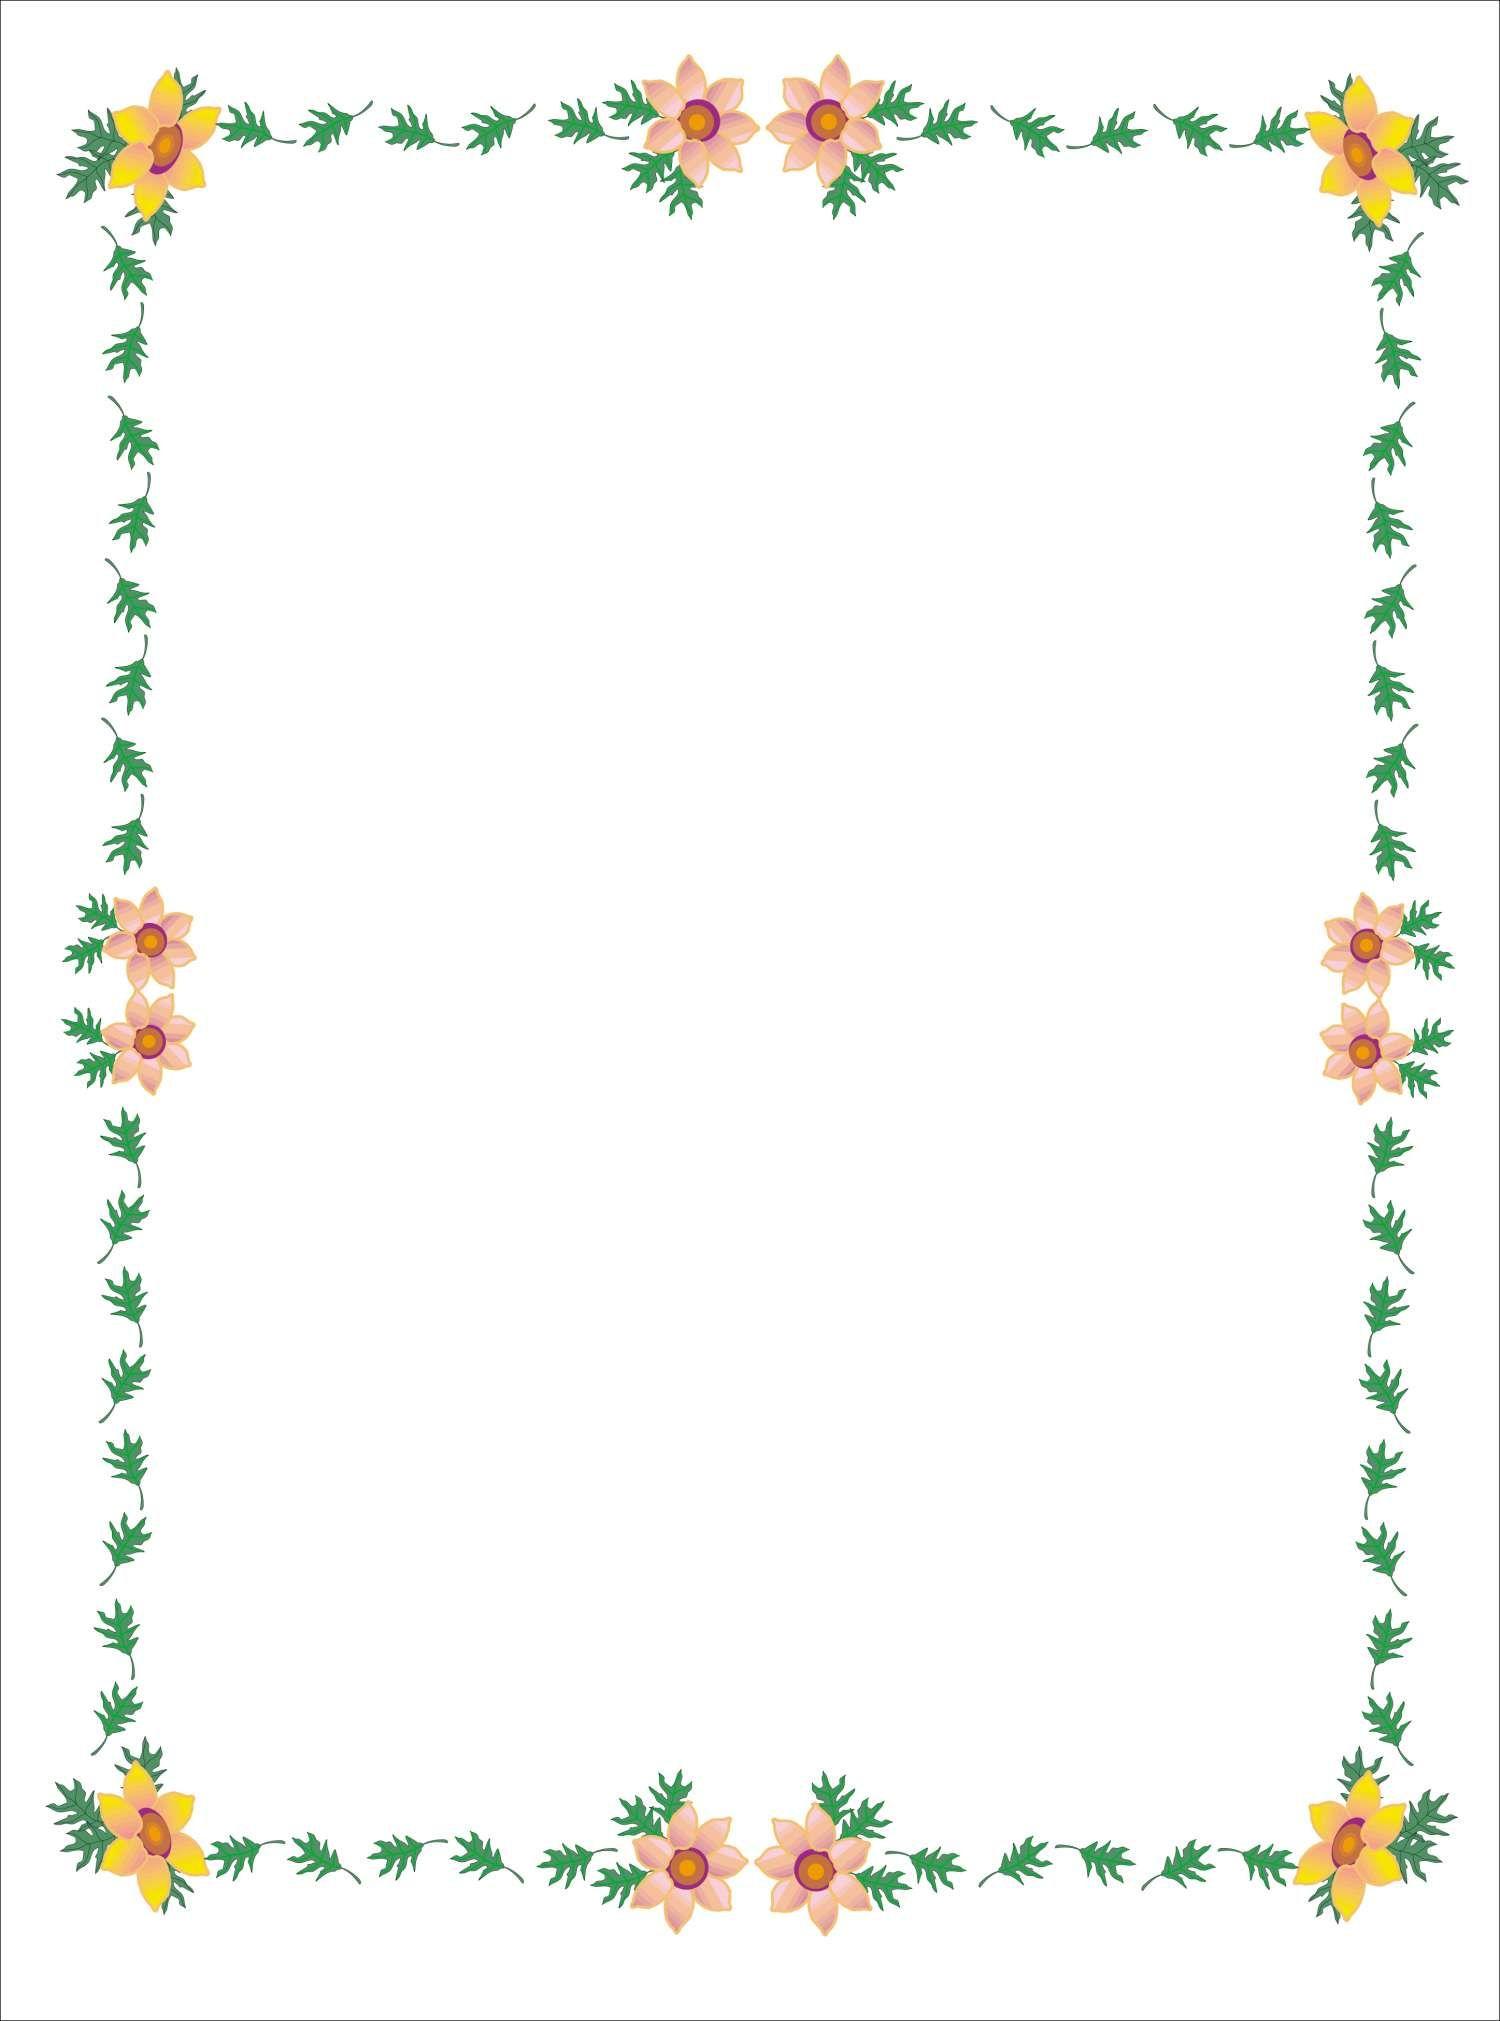 Pin de i t en borders frames flowers pinterest - Marcos decorados ...